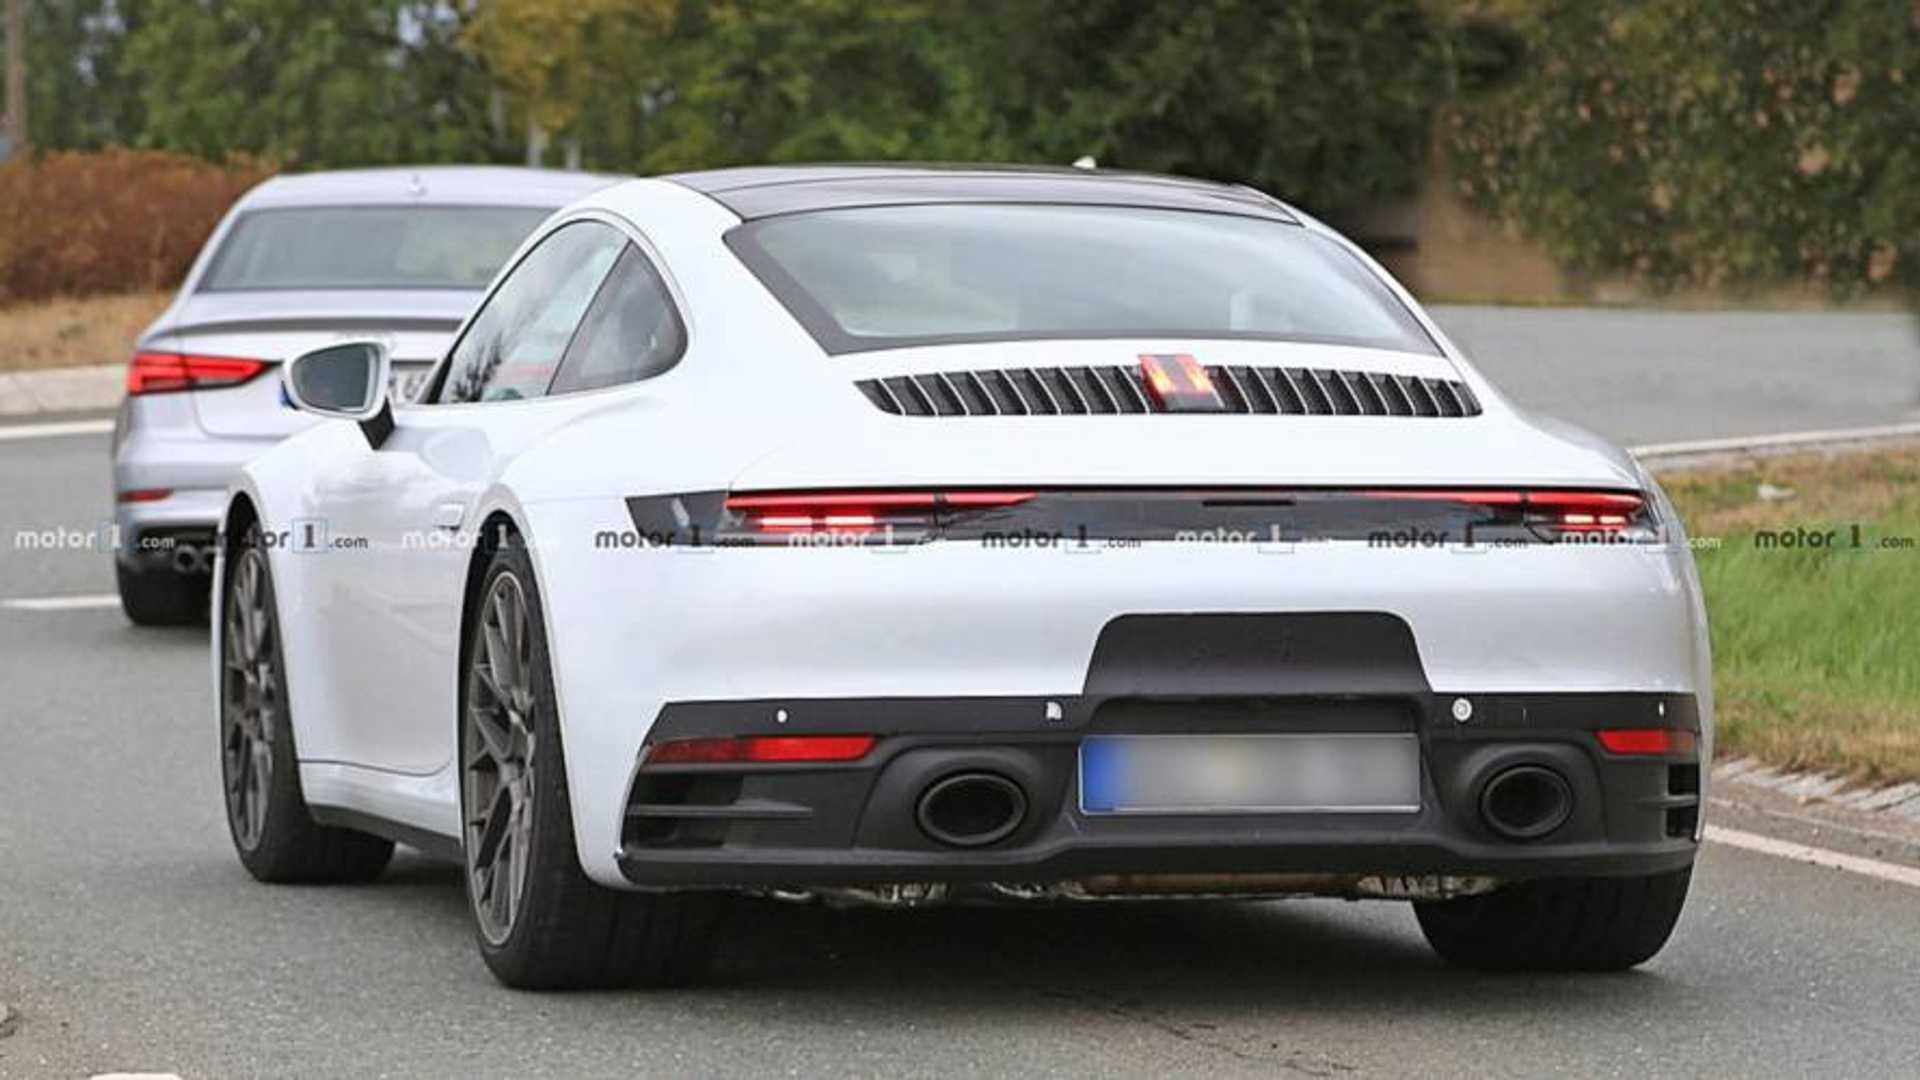 2018 - [Porsche] 911 - Page 8 Porsche-911-white-spy-shots